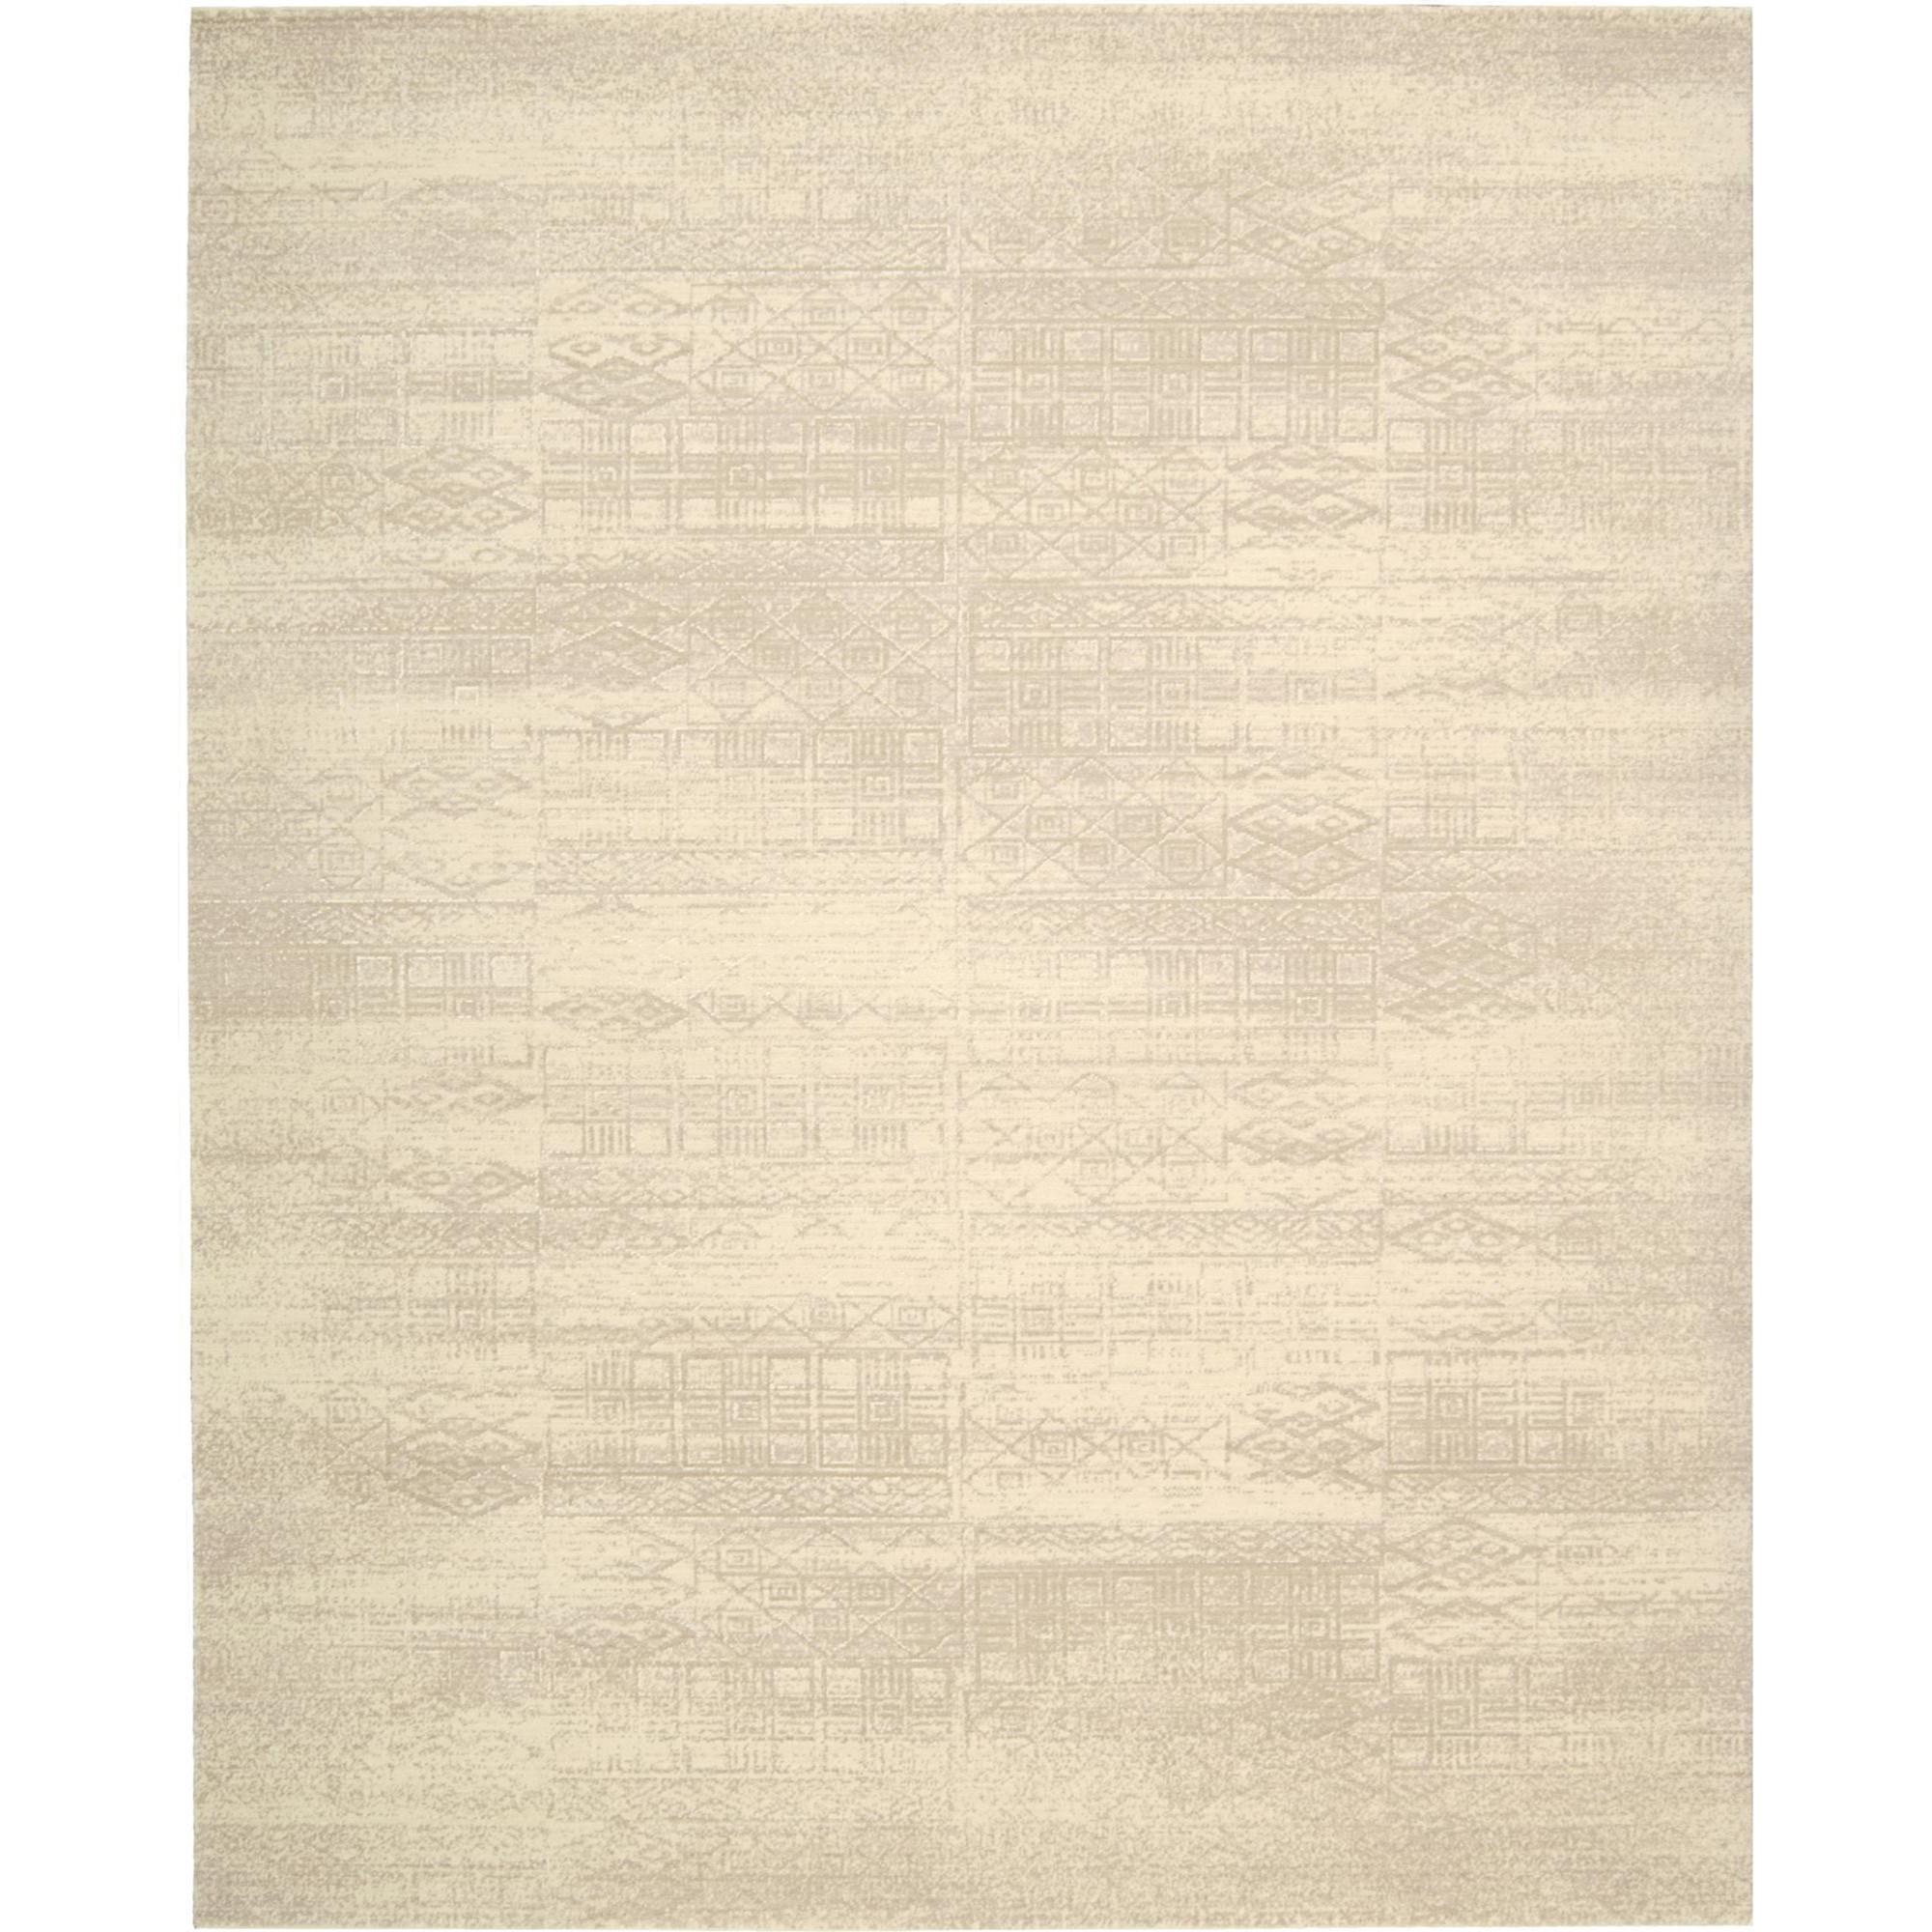 "Nourison Silk Elements 8'6"" x 11'6"" Bone Area Rug - Item Number: 29544"